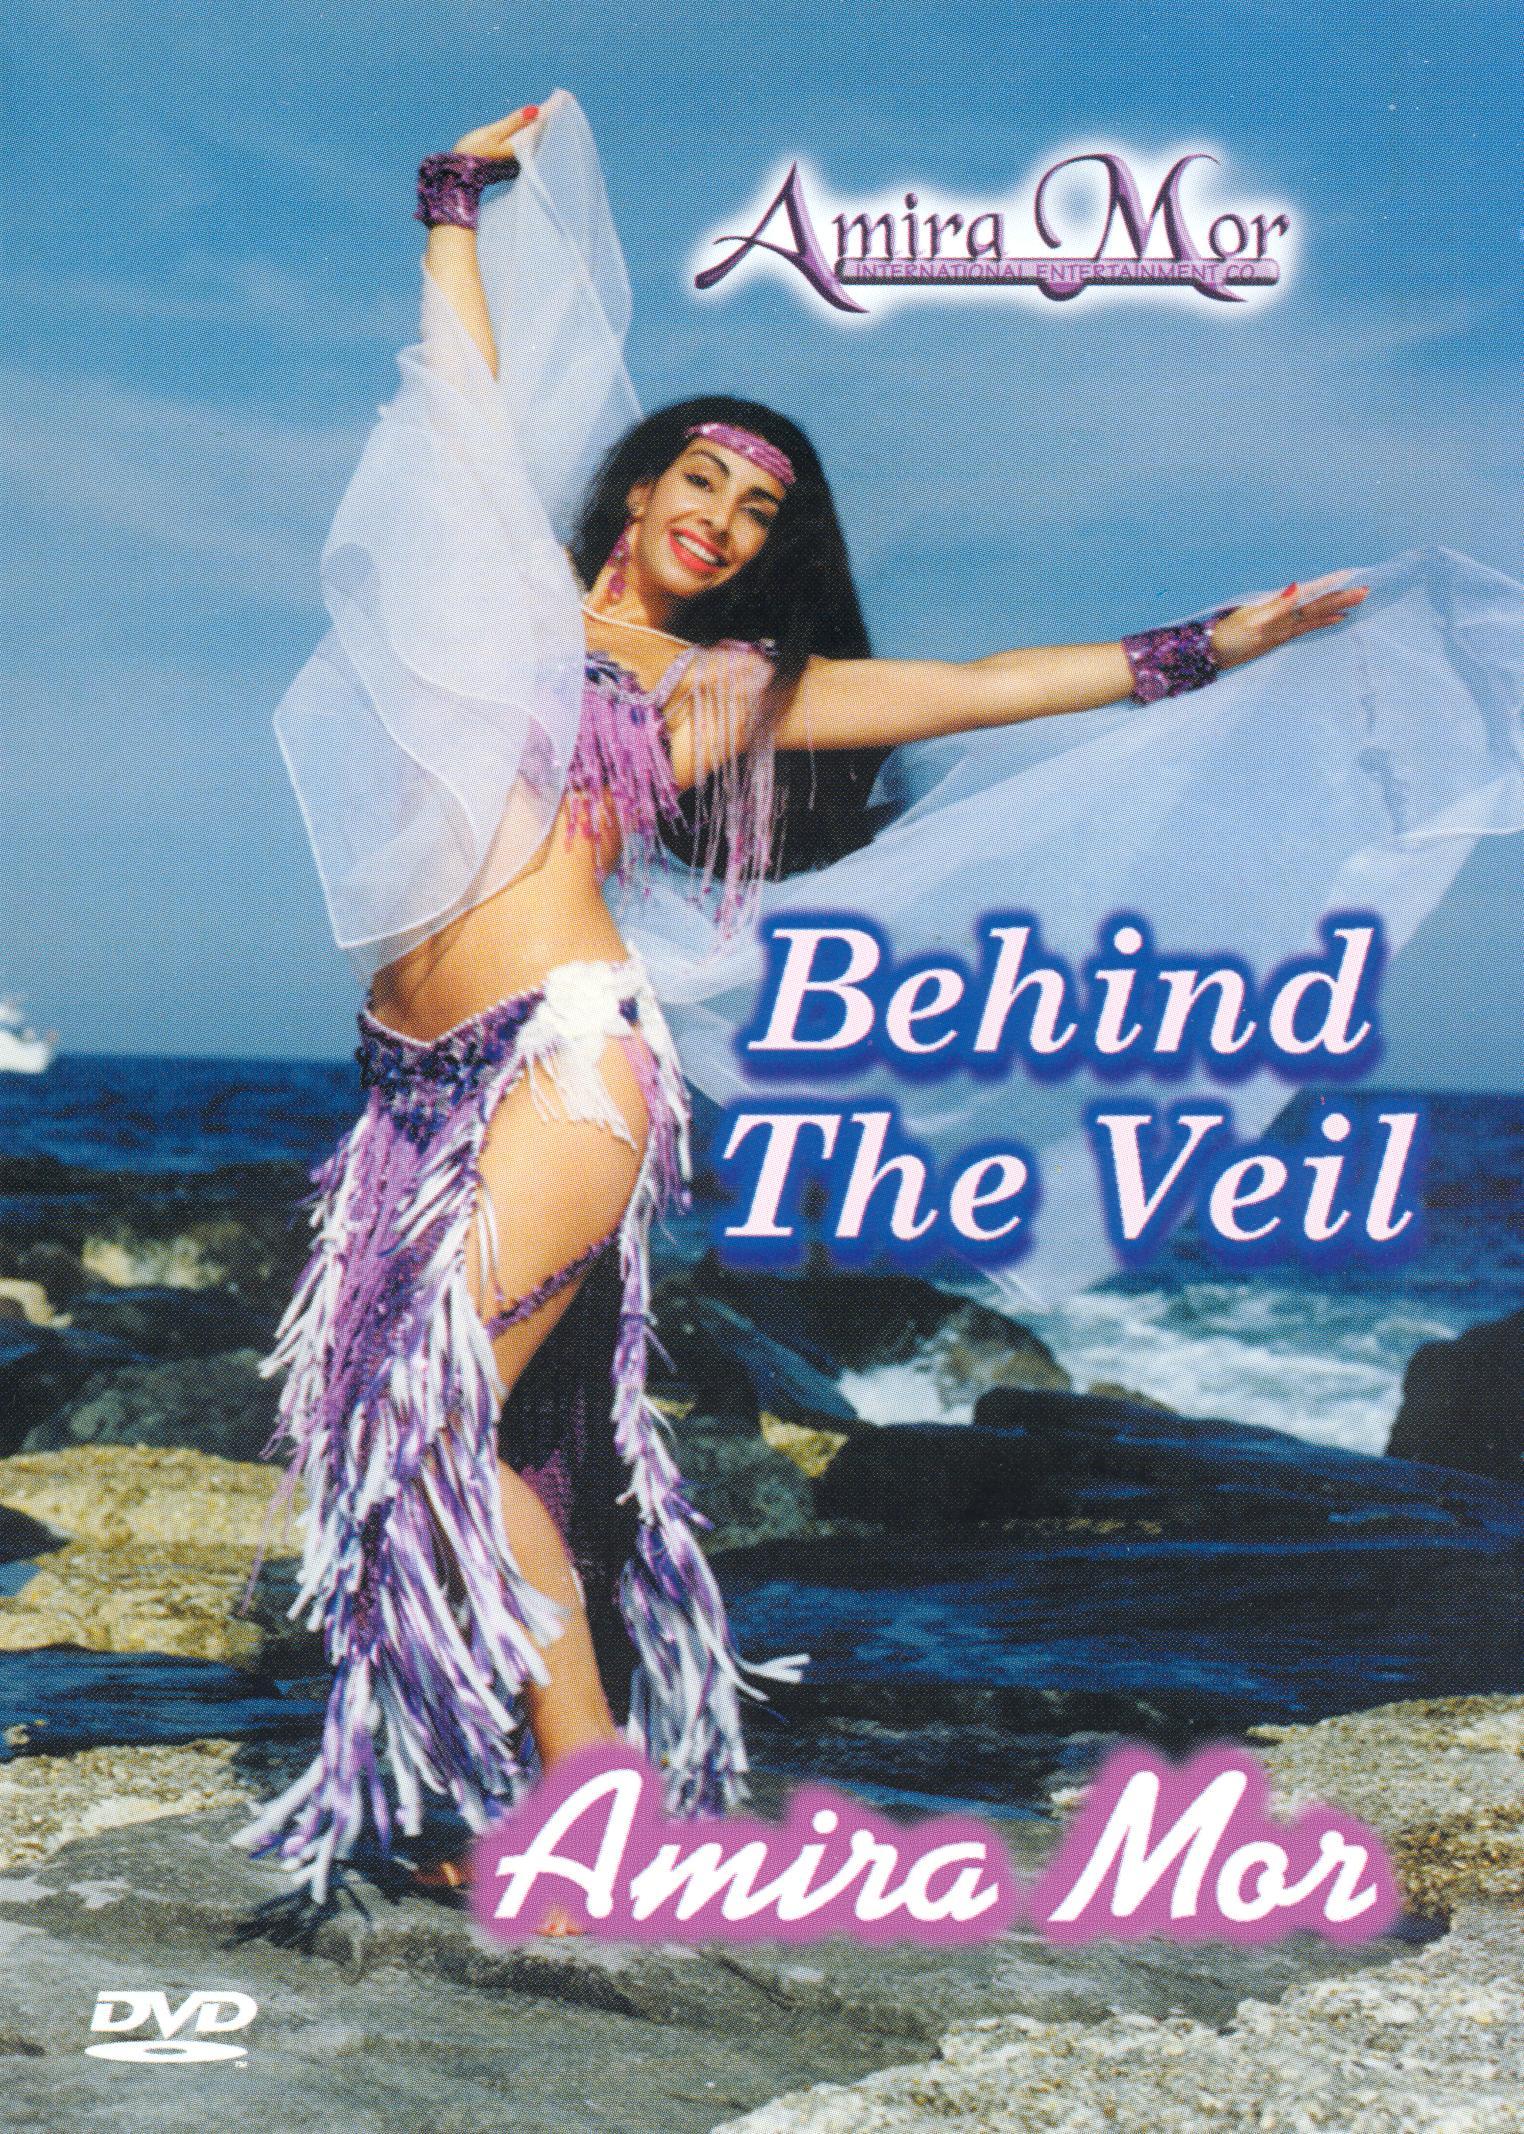 Amira Mor: Behind the Veil